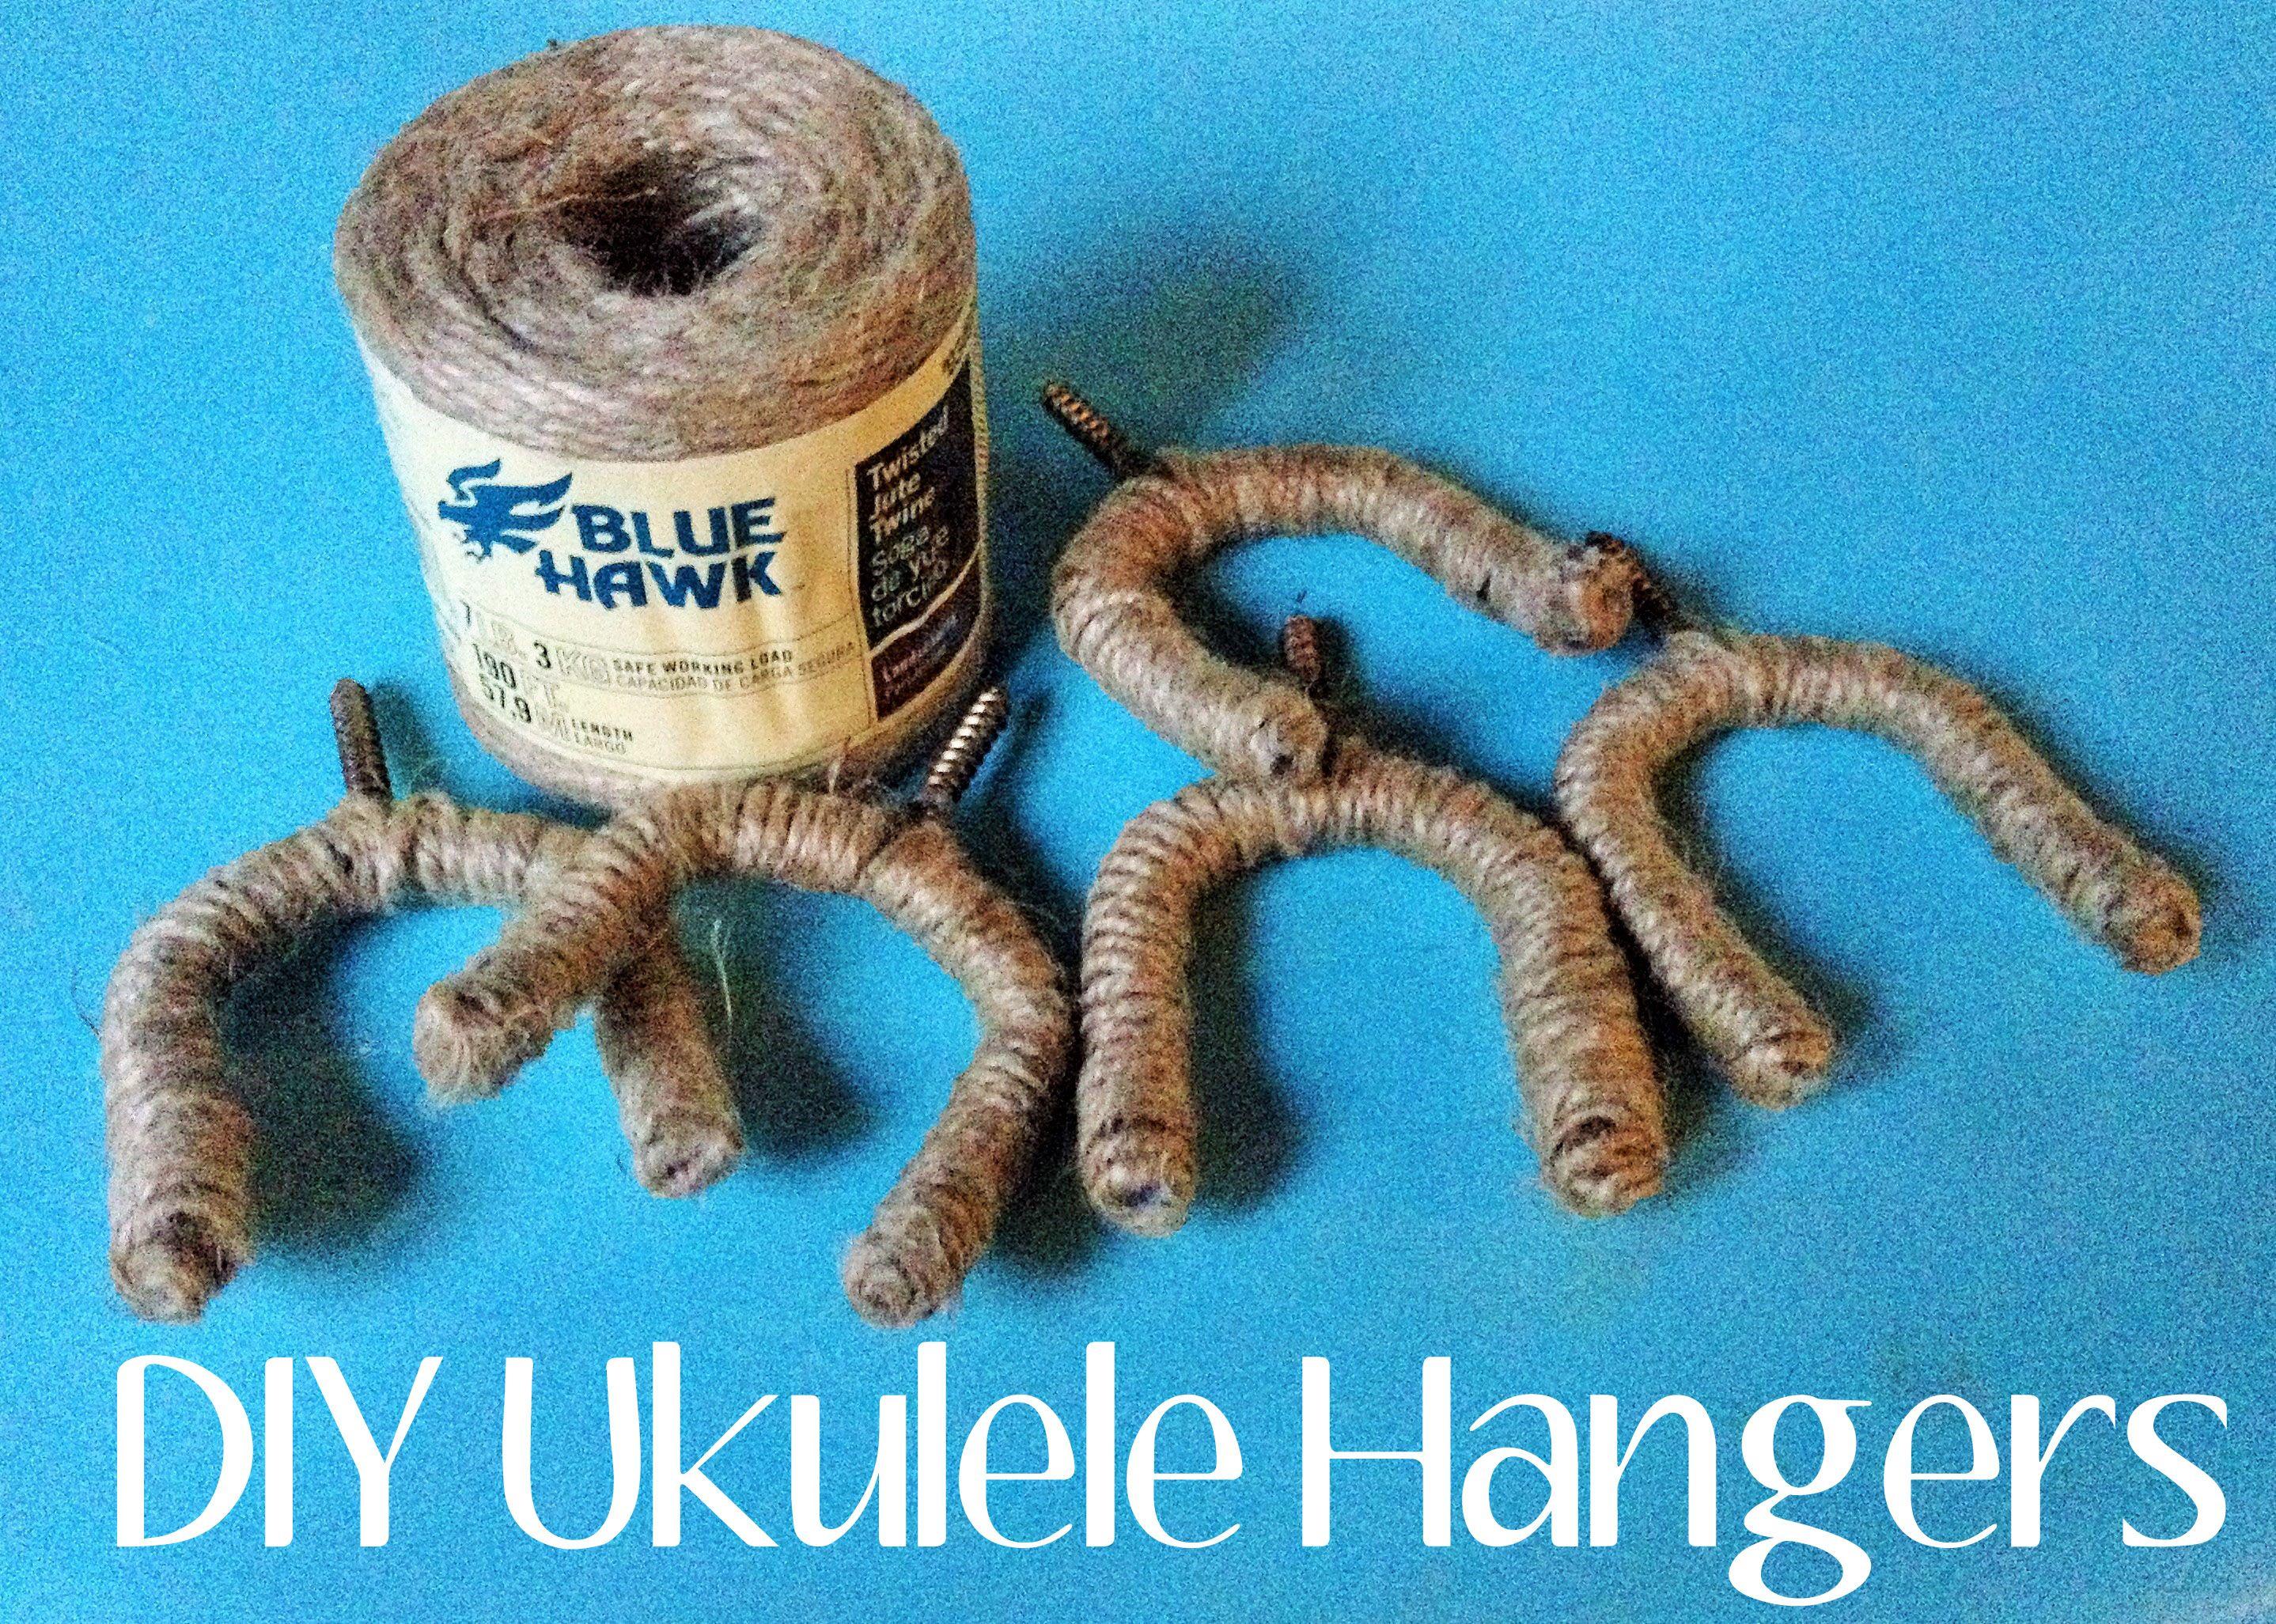 Diy Ukulele Hangers Made With Jute Guitar Hanger